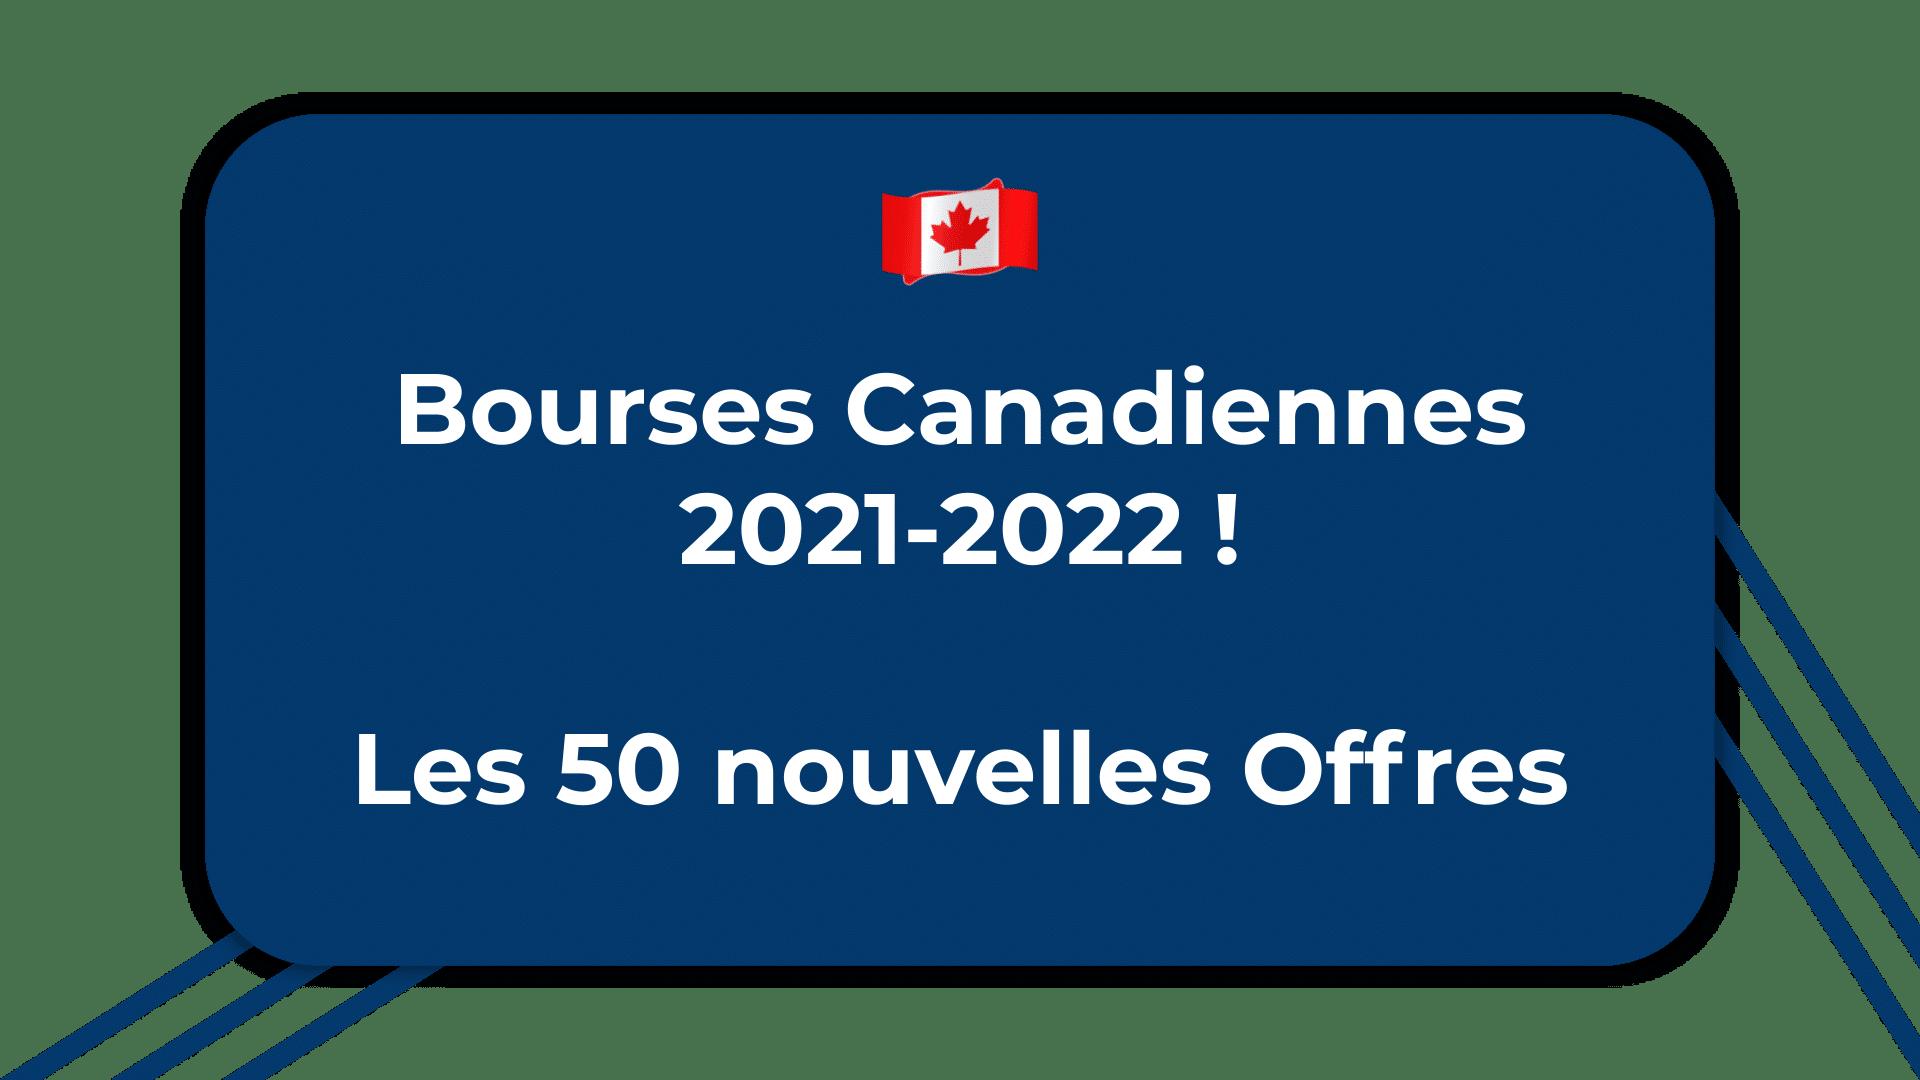 Bourses Canadiennes